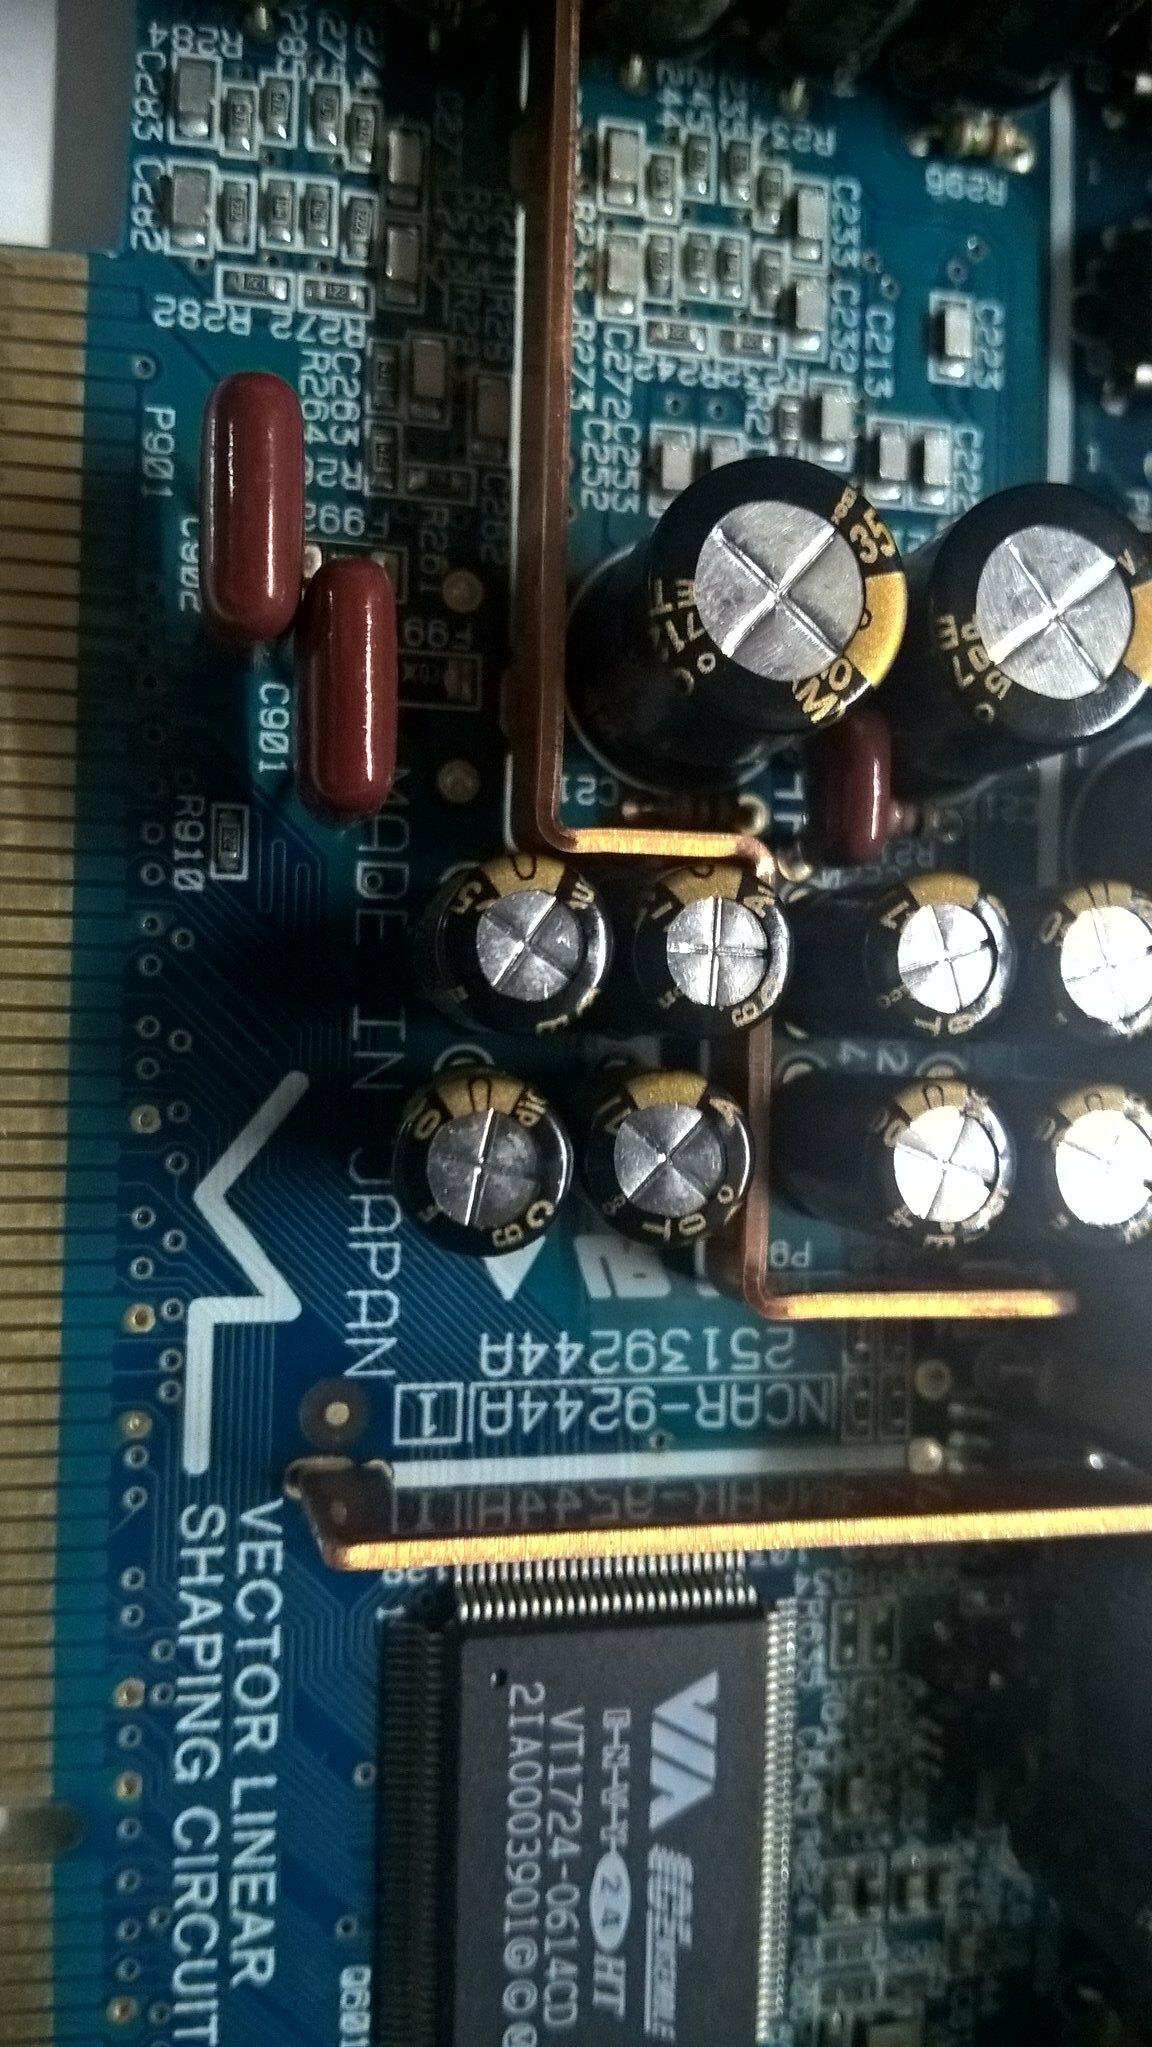 Onkyo từ Japan - U55SX, U55SX2, 200PCI LTD, 200PCI, 150PCI, 90PCI - 8